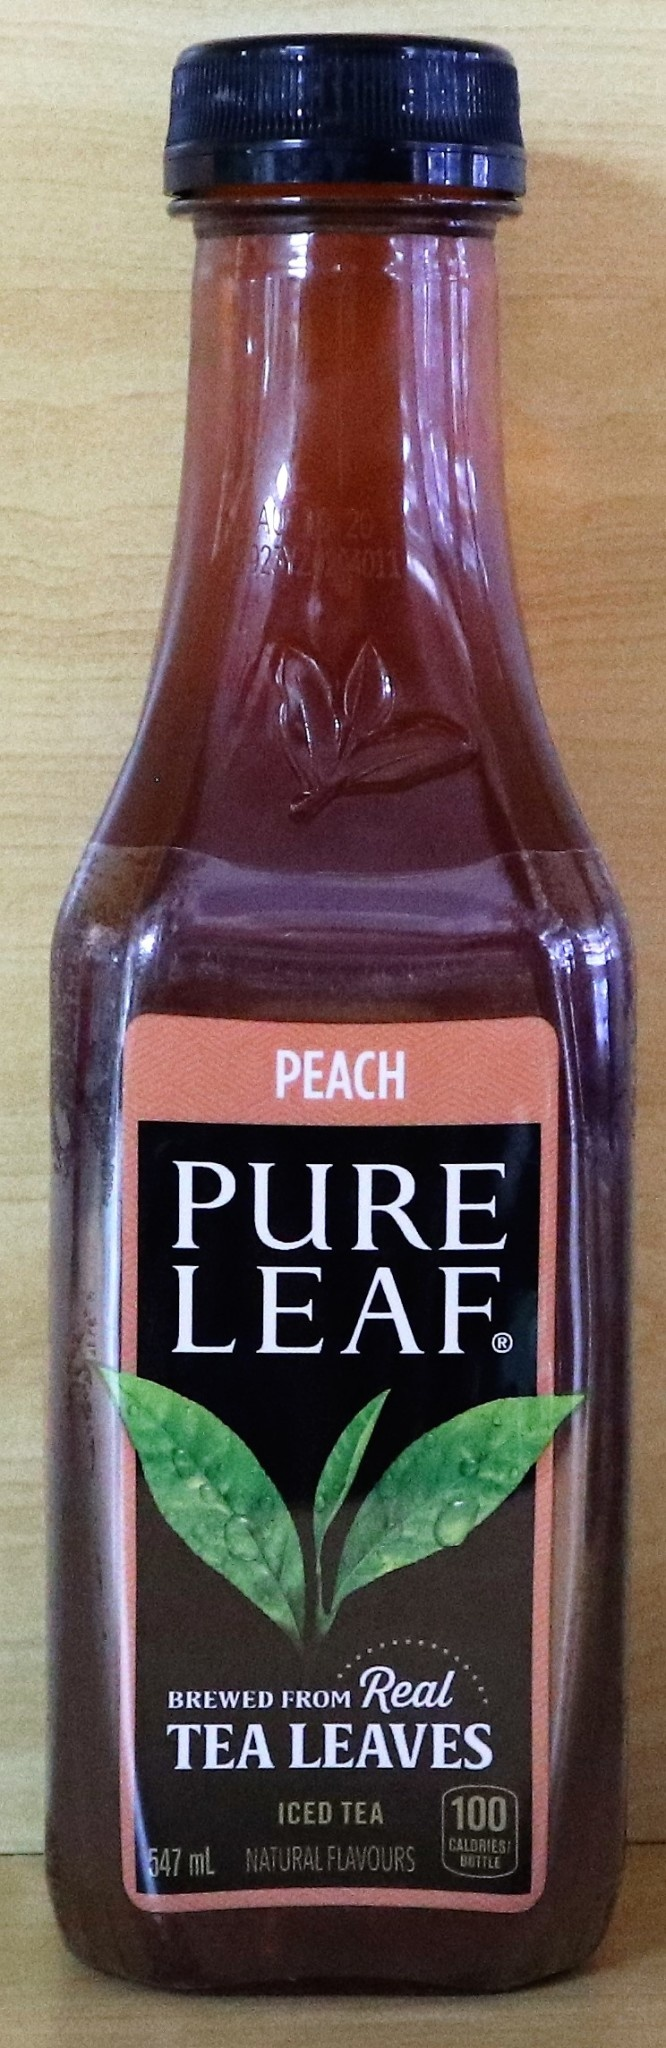 Pure Leaf - Peach - 547mL bottle